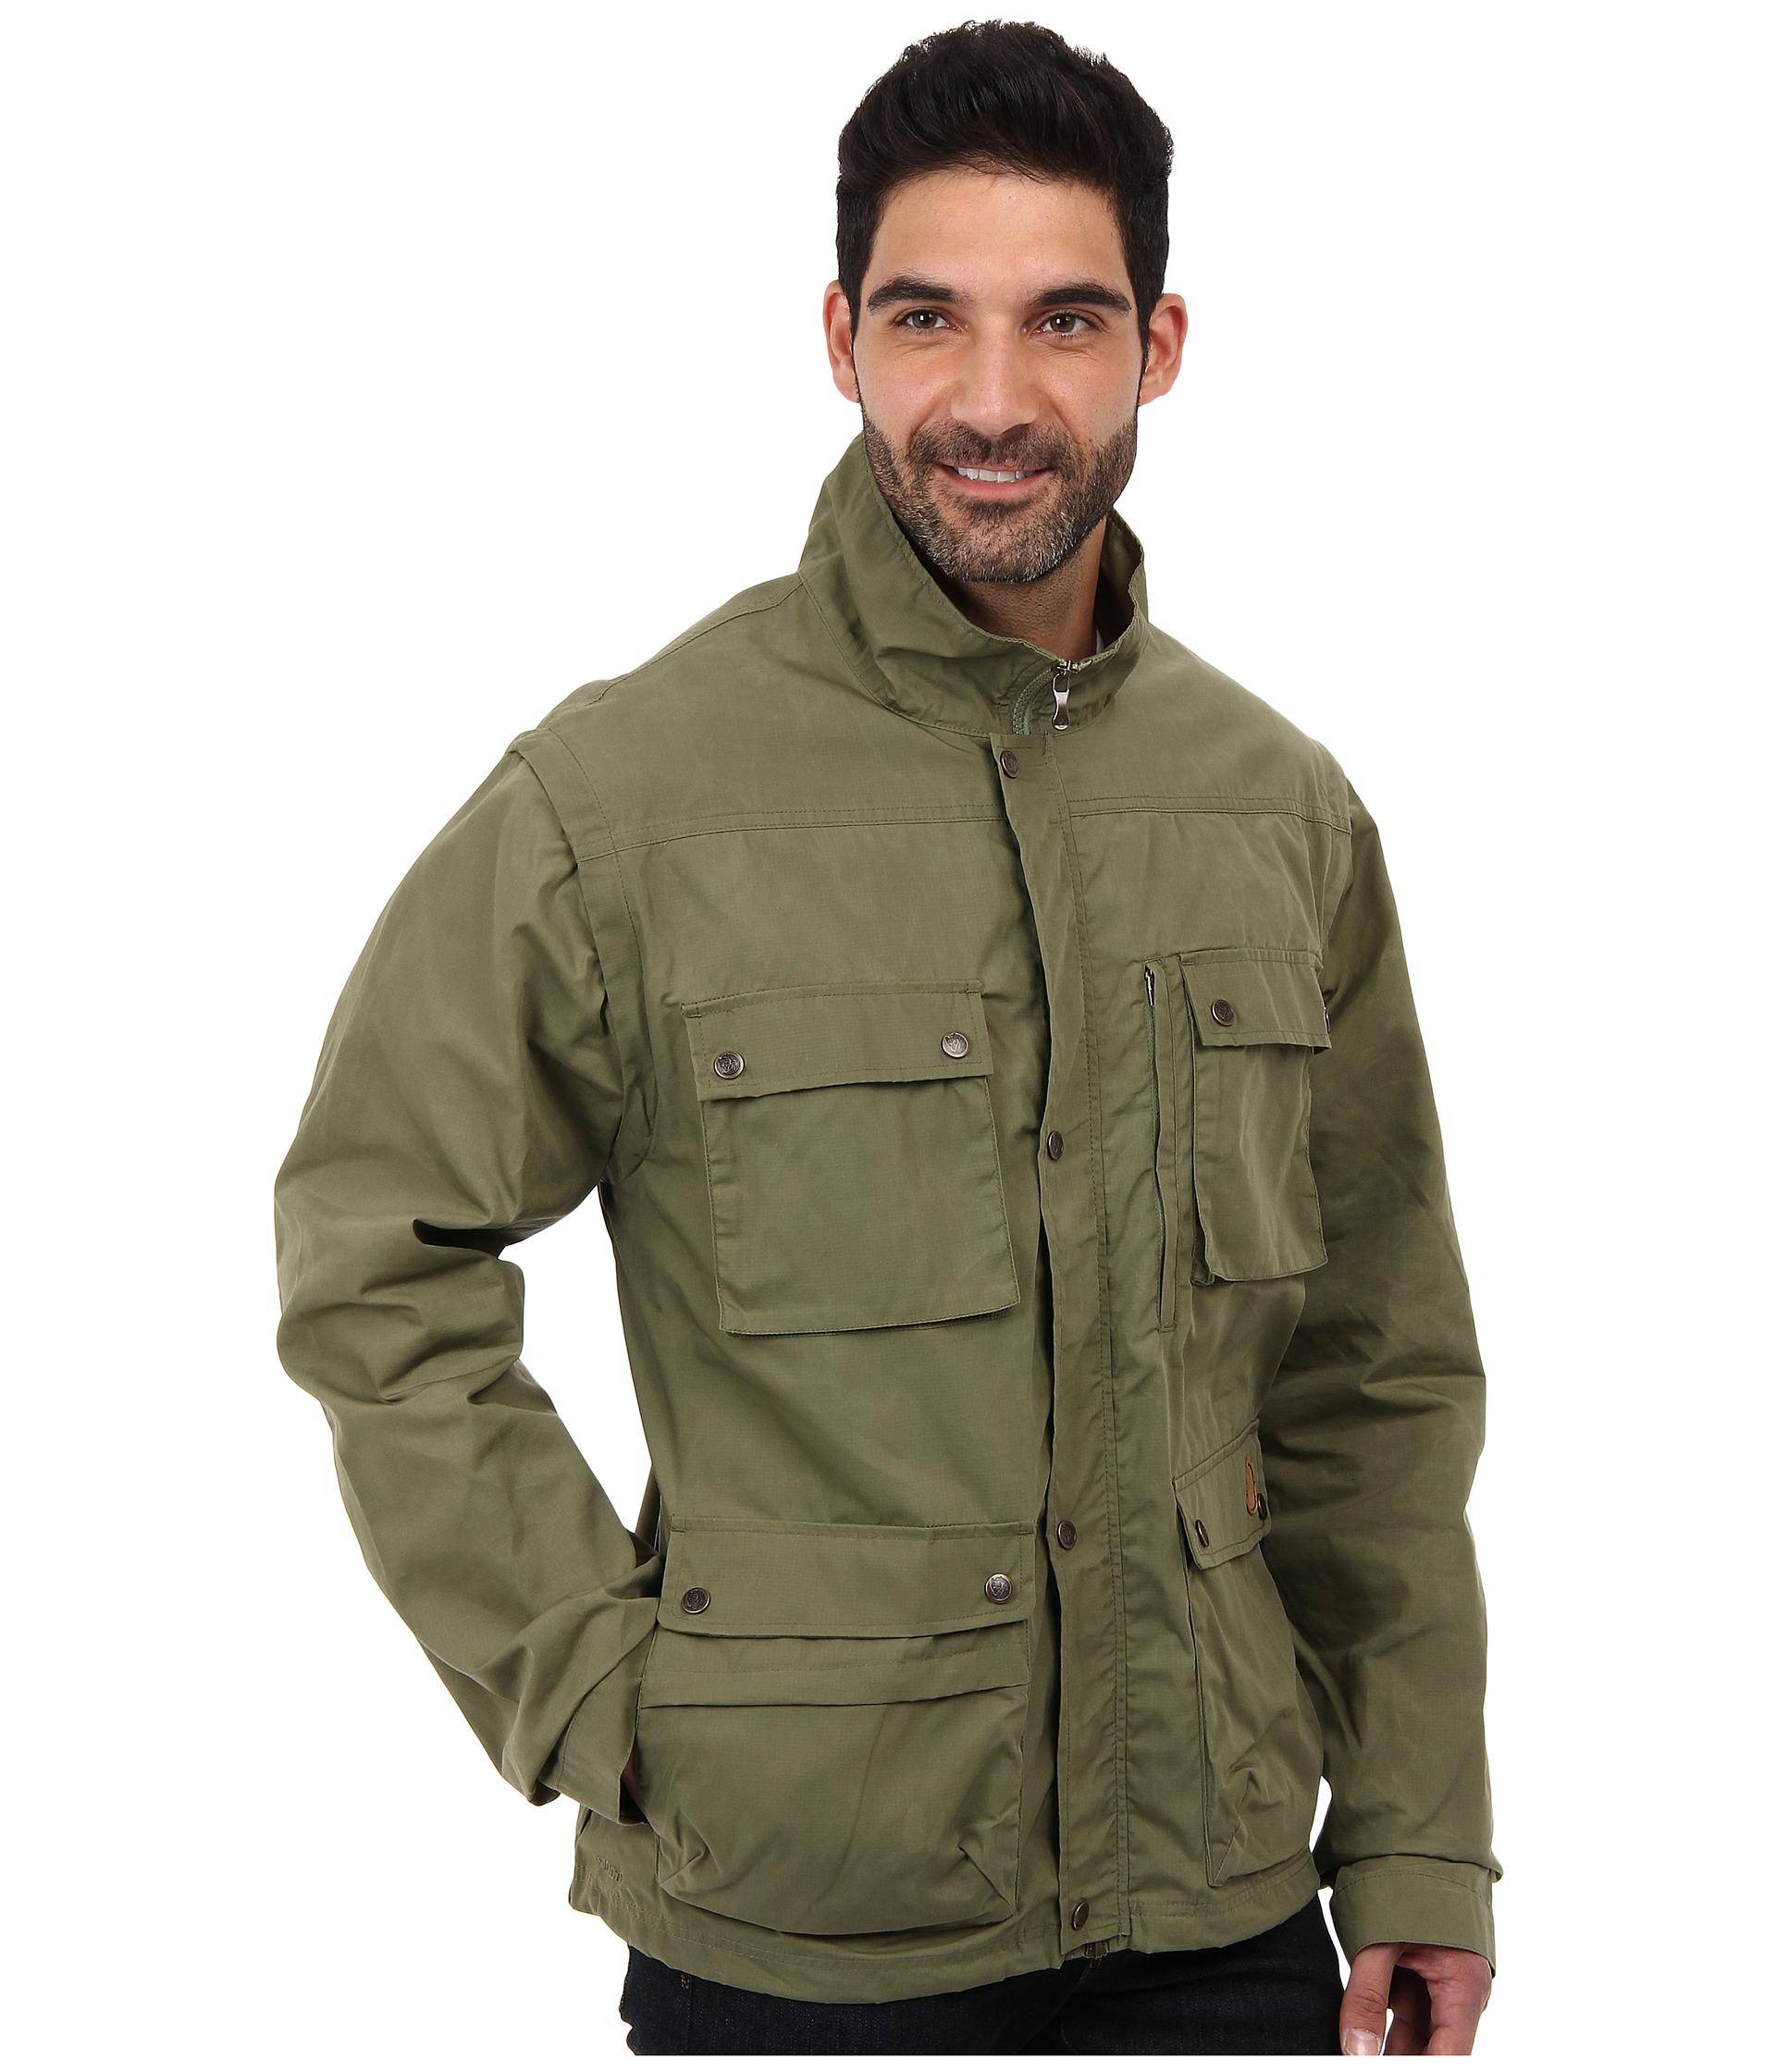 fjallraven reporter lite jacket review